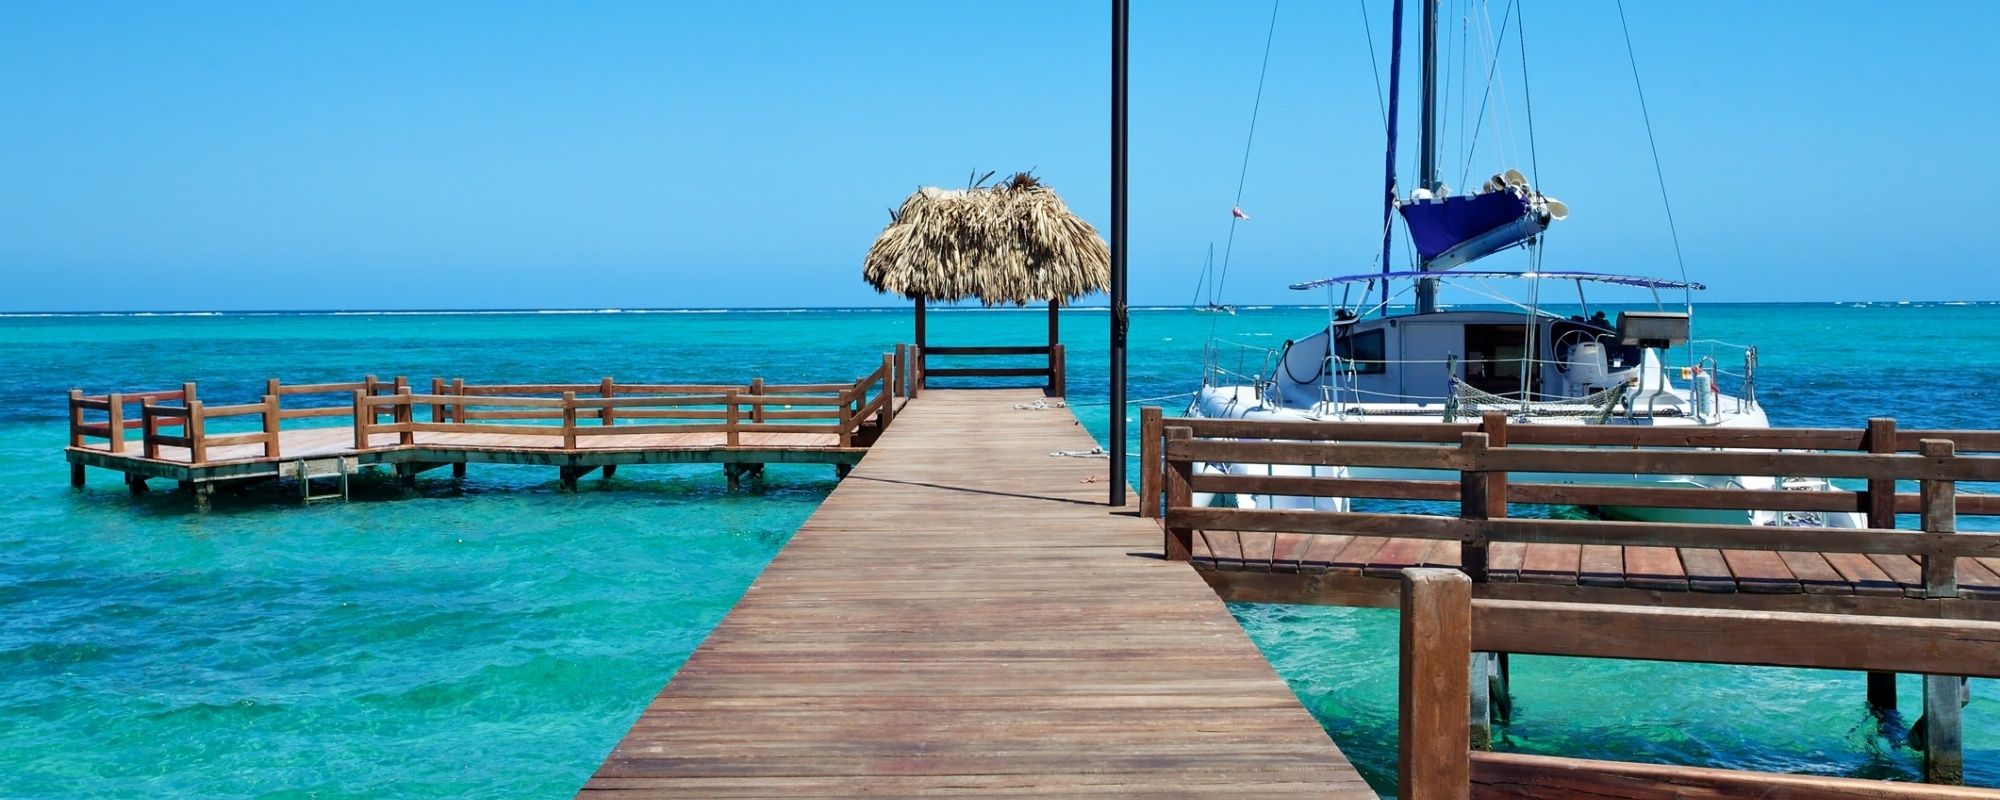 Ambergris Caye Boat Dock